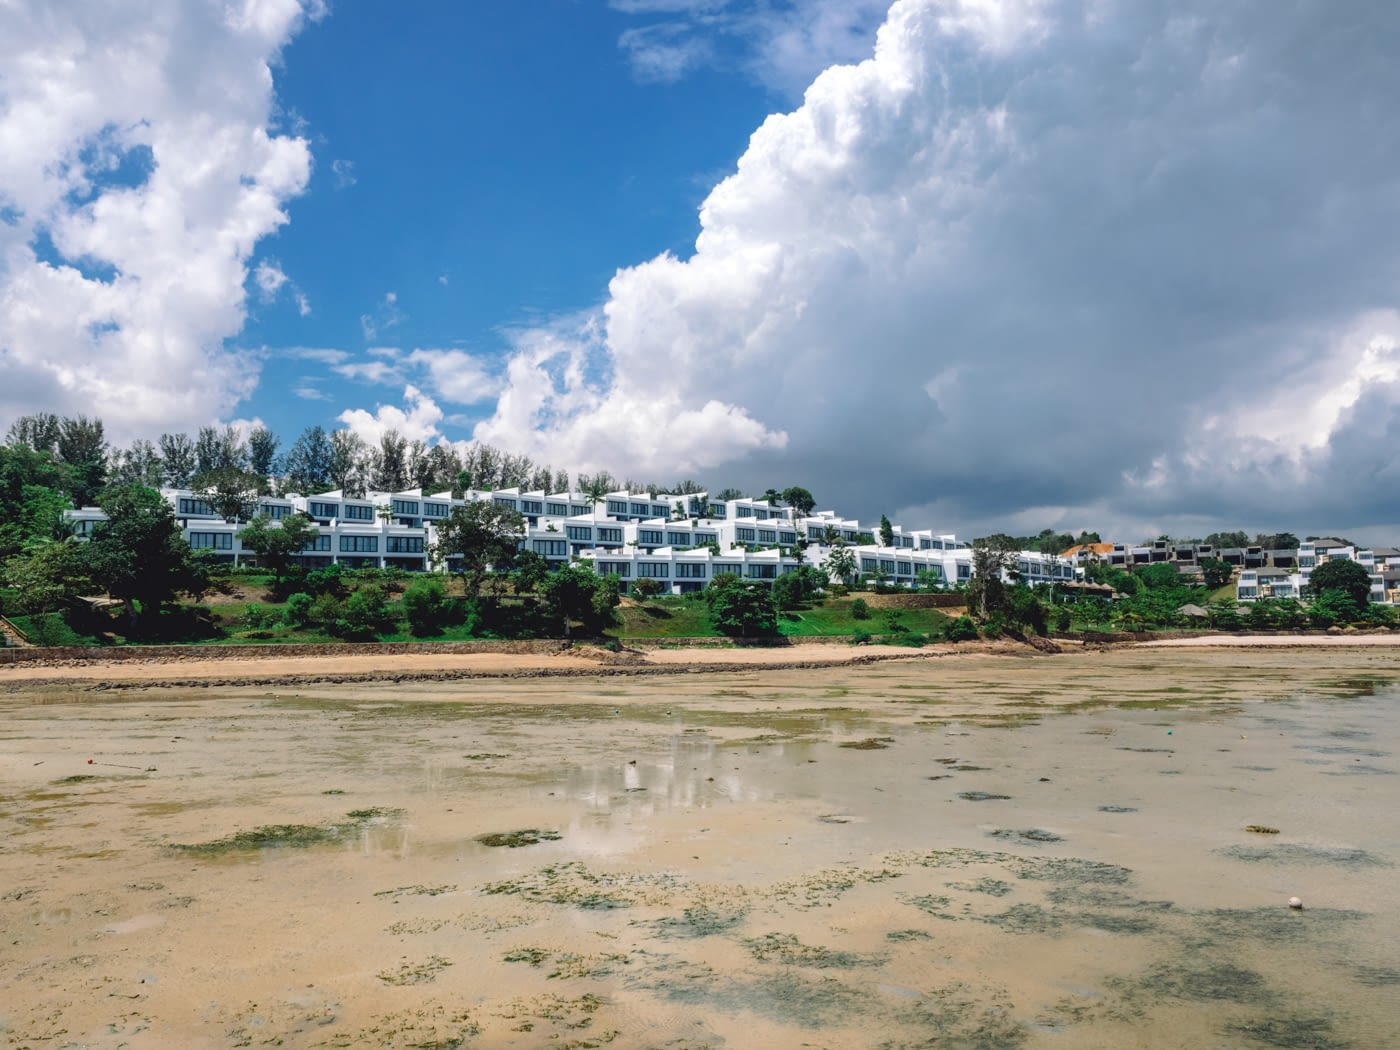 Indonesia - Montigo - View of the resort from the bridge